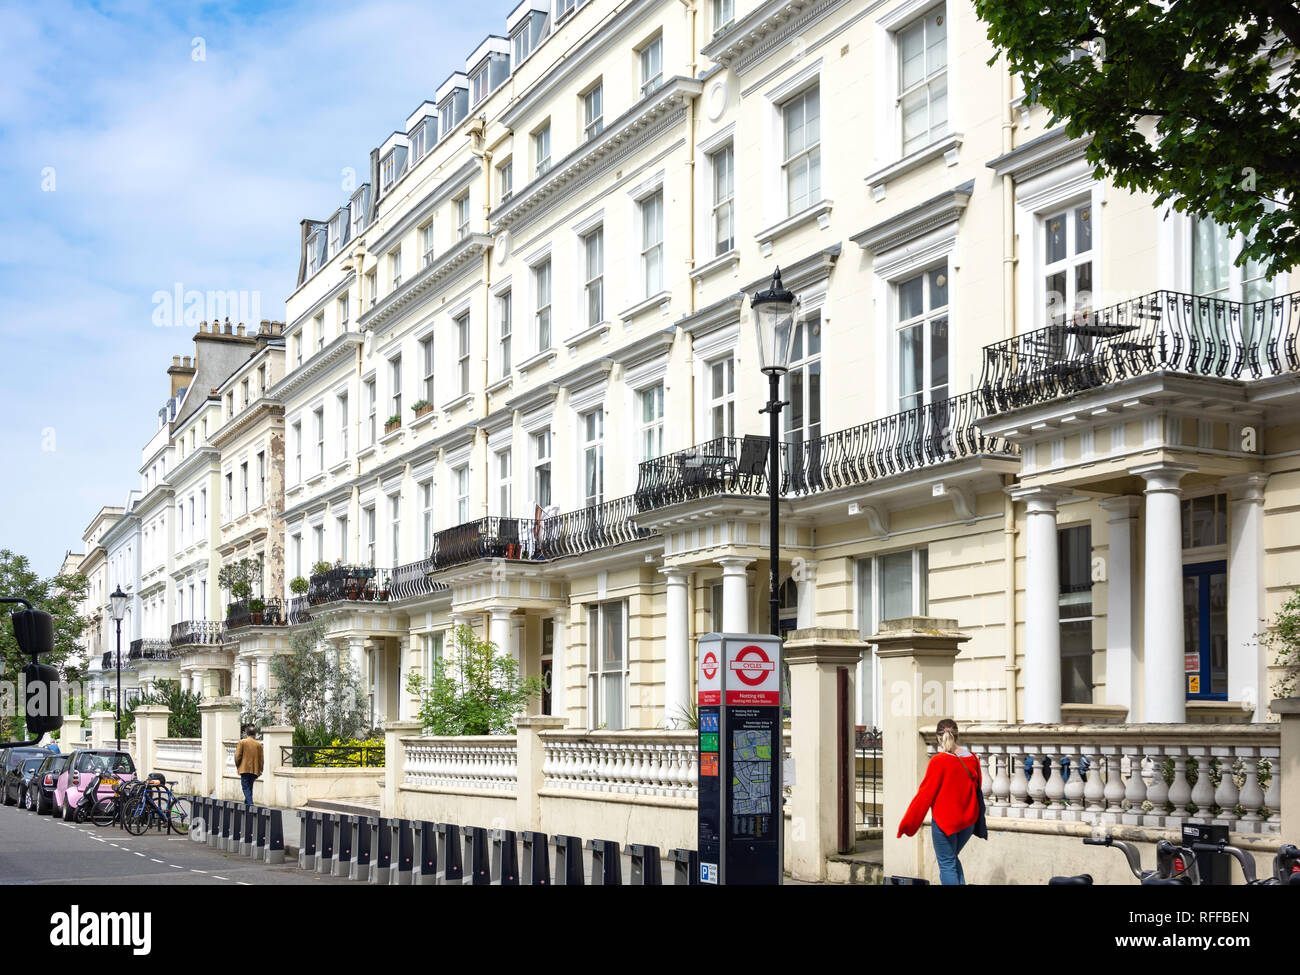 Victorian townhouses, Pembridge Gardens, Notting Hill, Royal Borough of Kensington and Chelsea, Greater London, England, United Kingdom - Stock Image